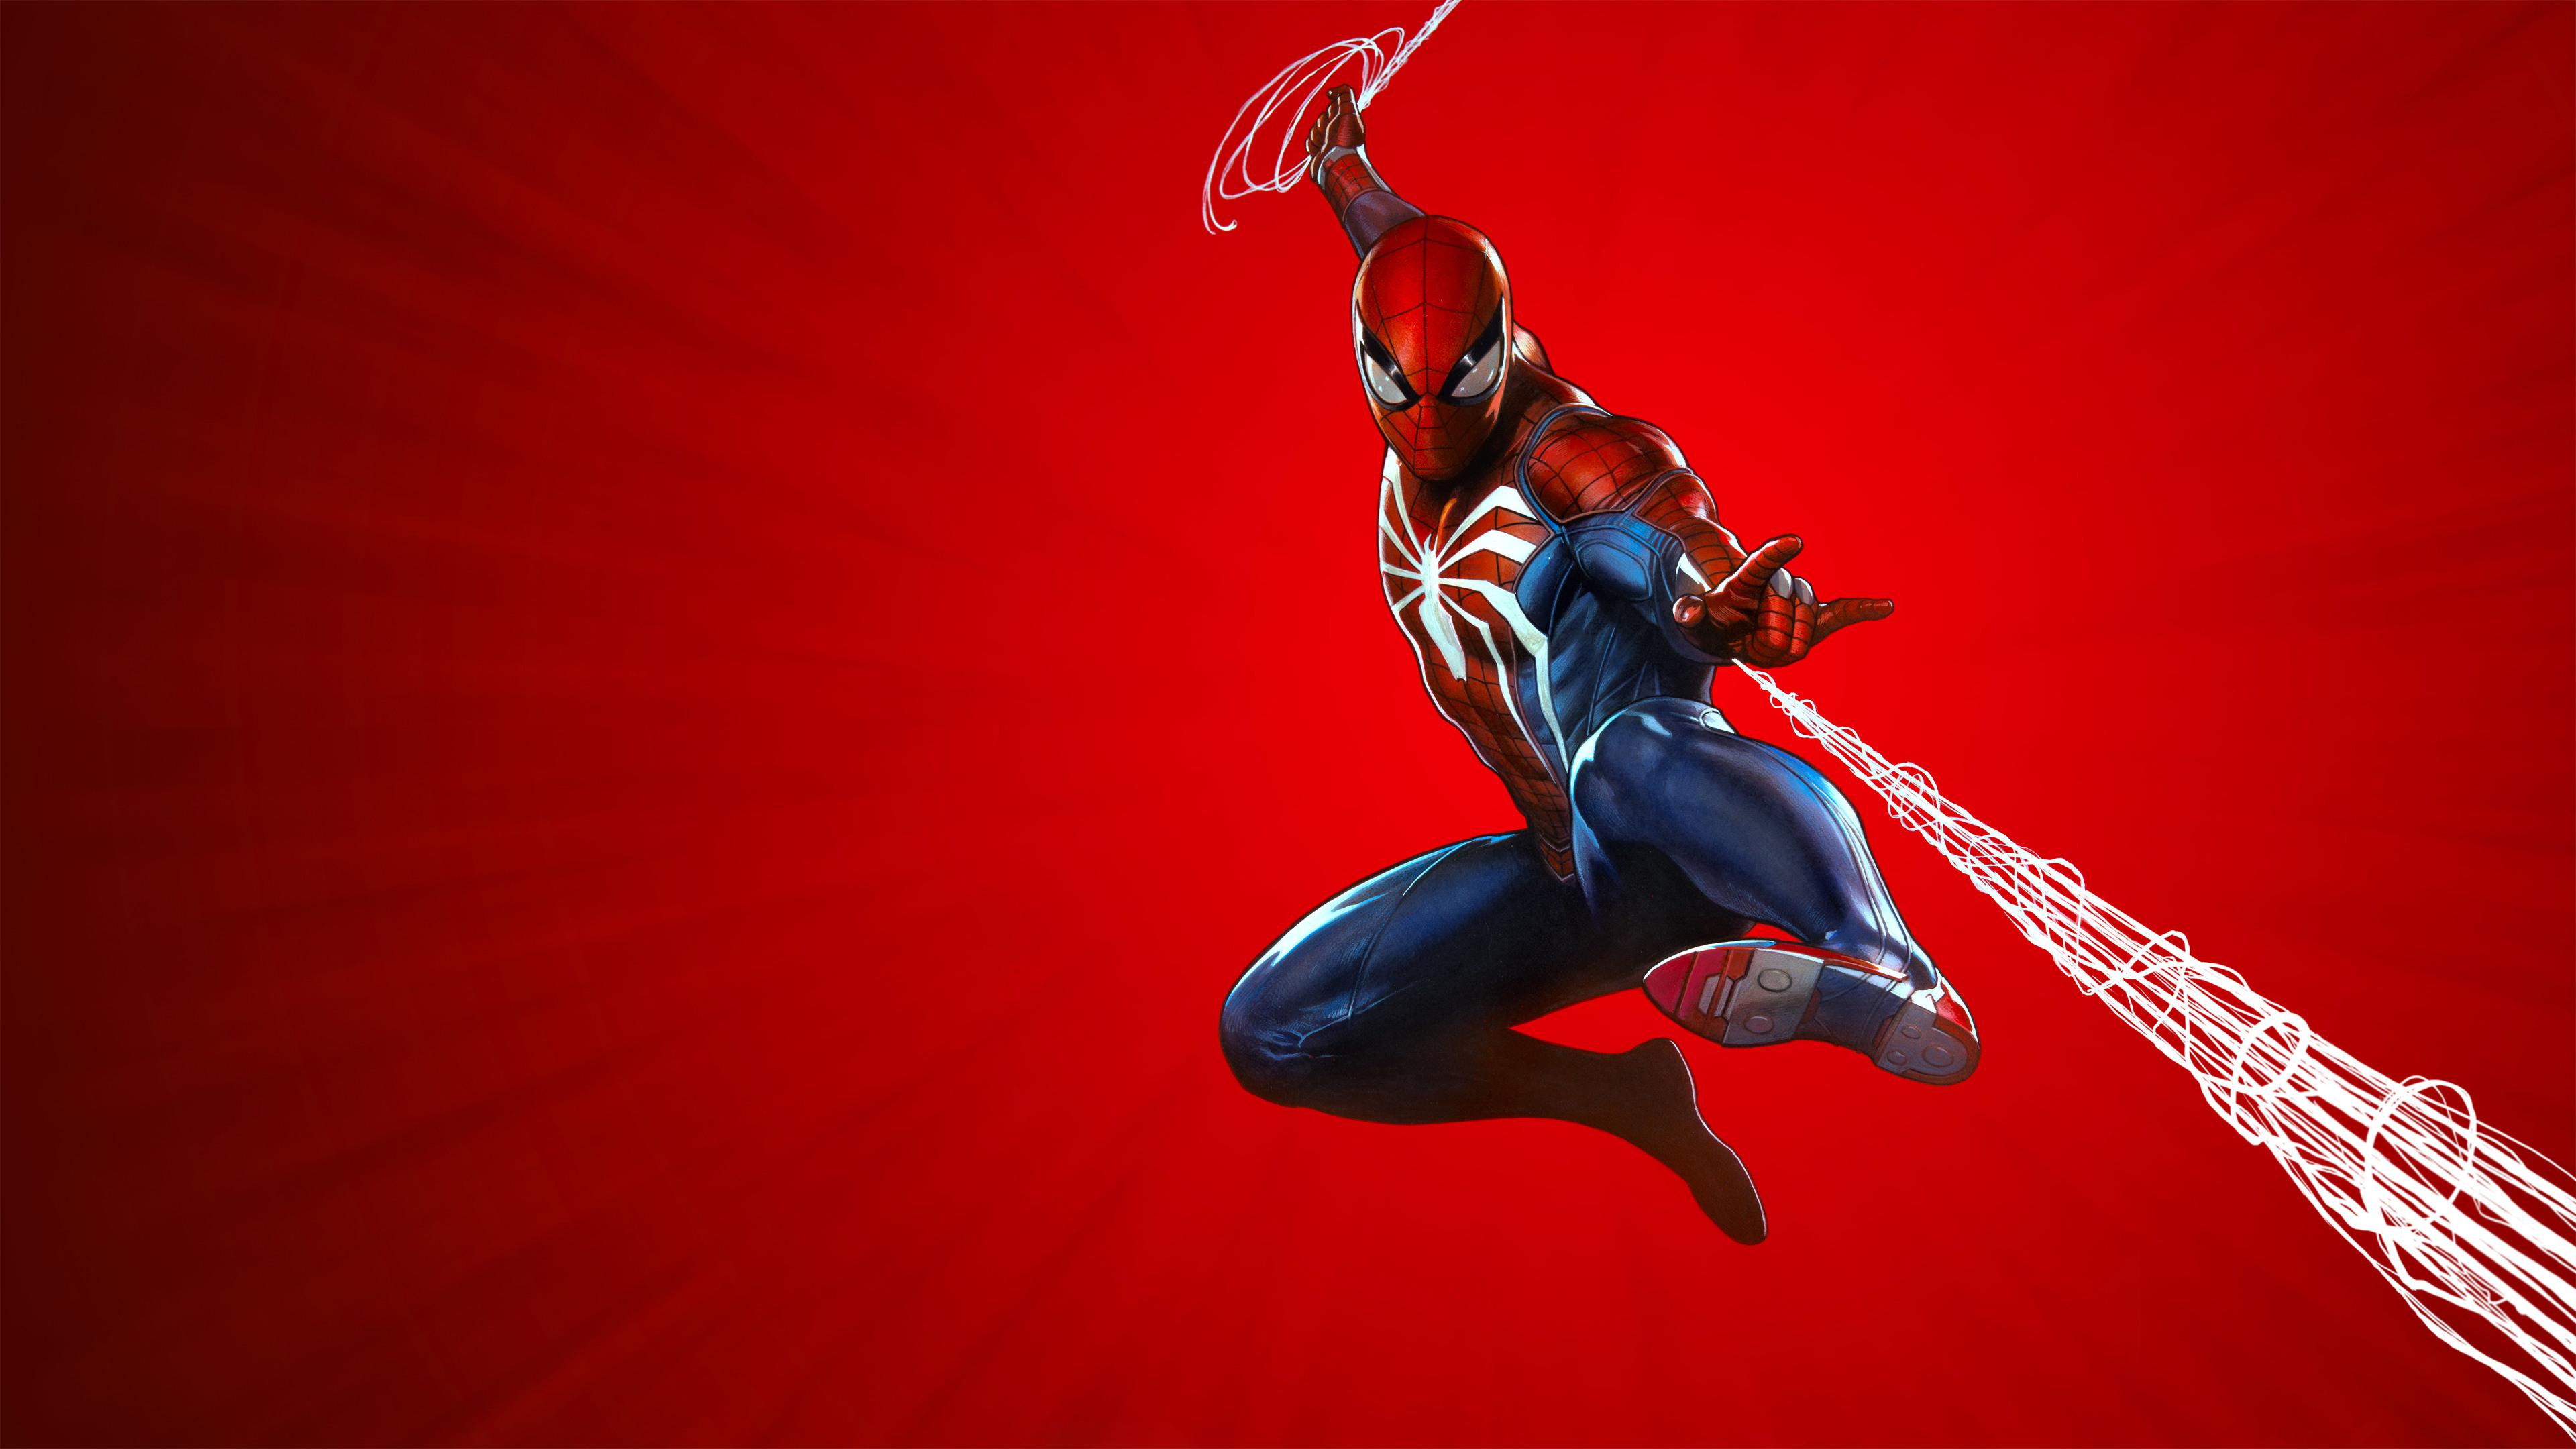 marvels spider man ps4 theme art 10k 1537691201 - Marvels Spider Man PS4 Theme Art 10k - spiderman wallpapers, spiderman ps4 wallpapers, ps games wallpapers, hd-wallpapers, games wallpapers, 8k wallpapers, 5k wallpapers, 4k-wallpapers, 2018 games wallpapers, 10k wallpapers